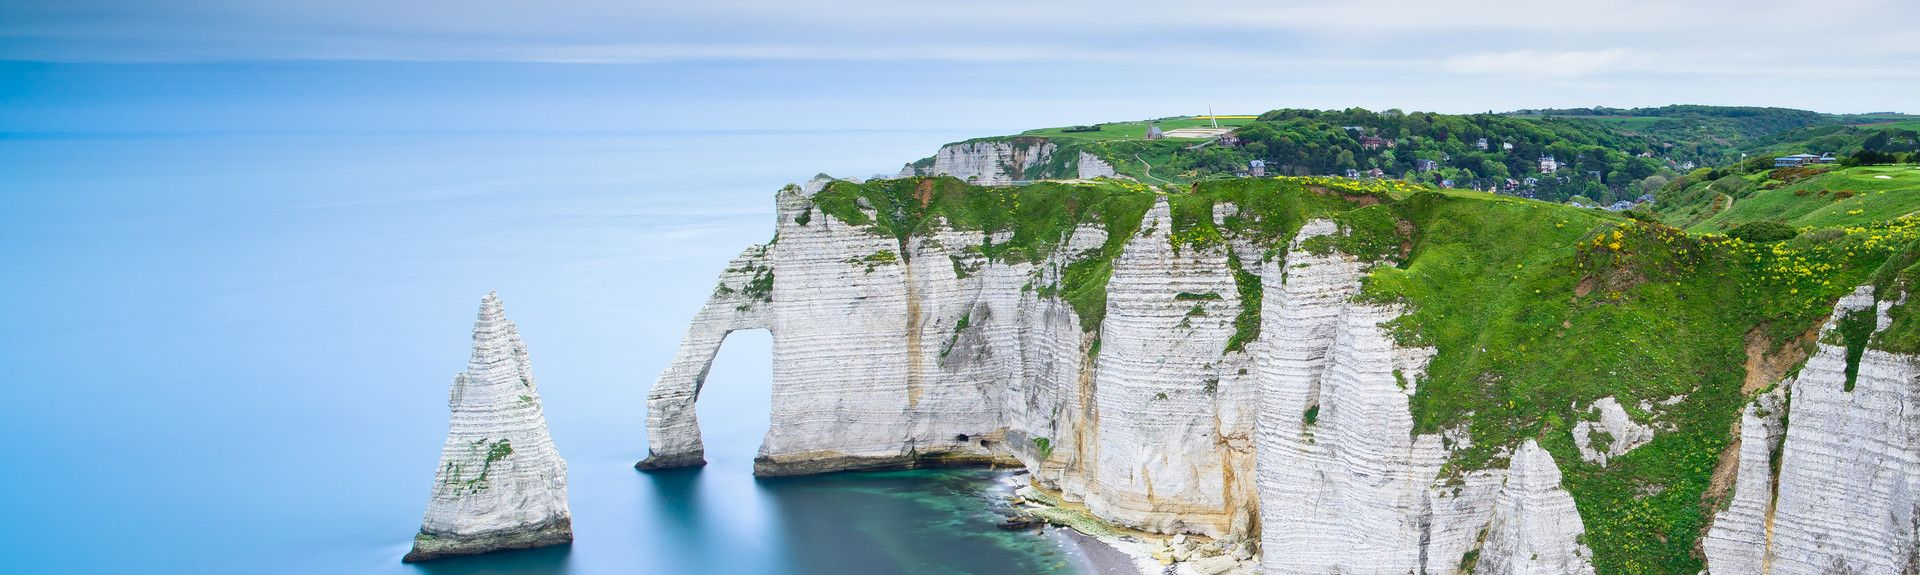 Étretat, Normandie, Frankreich